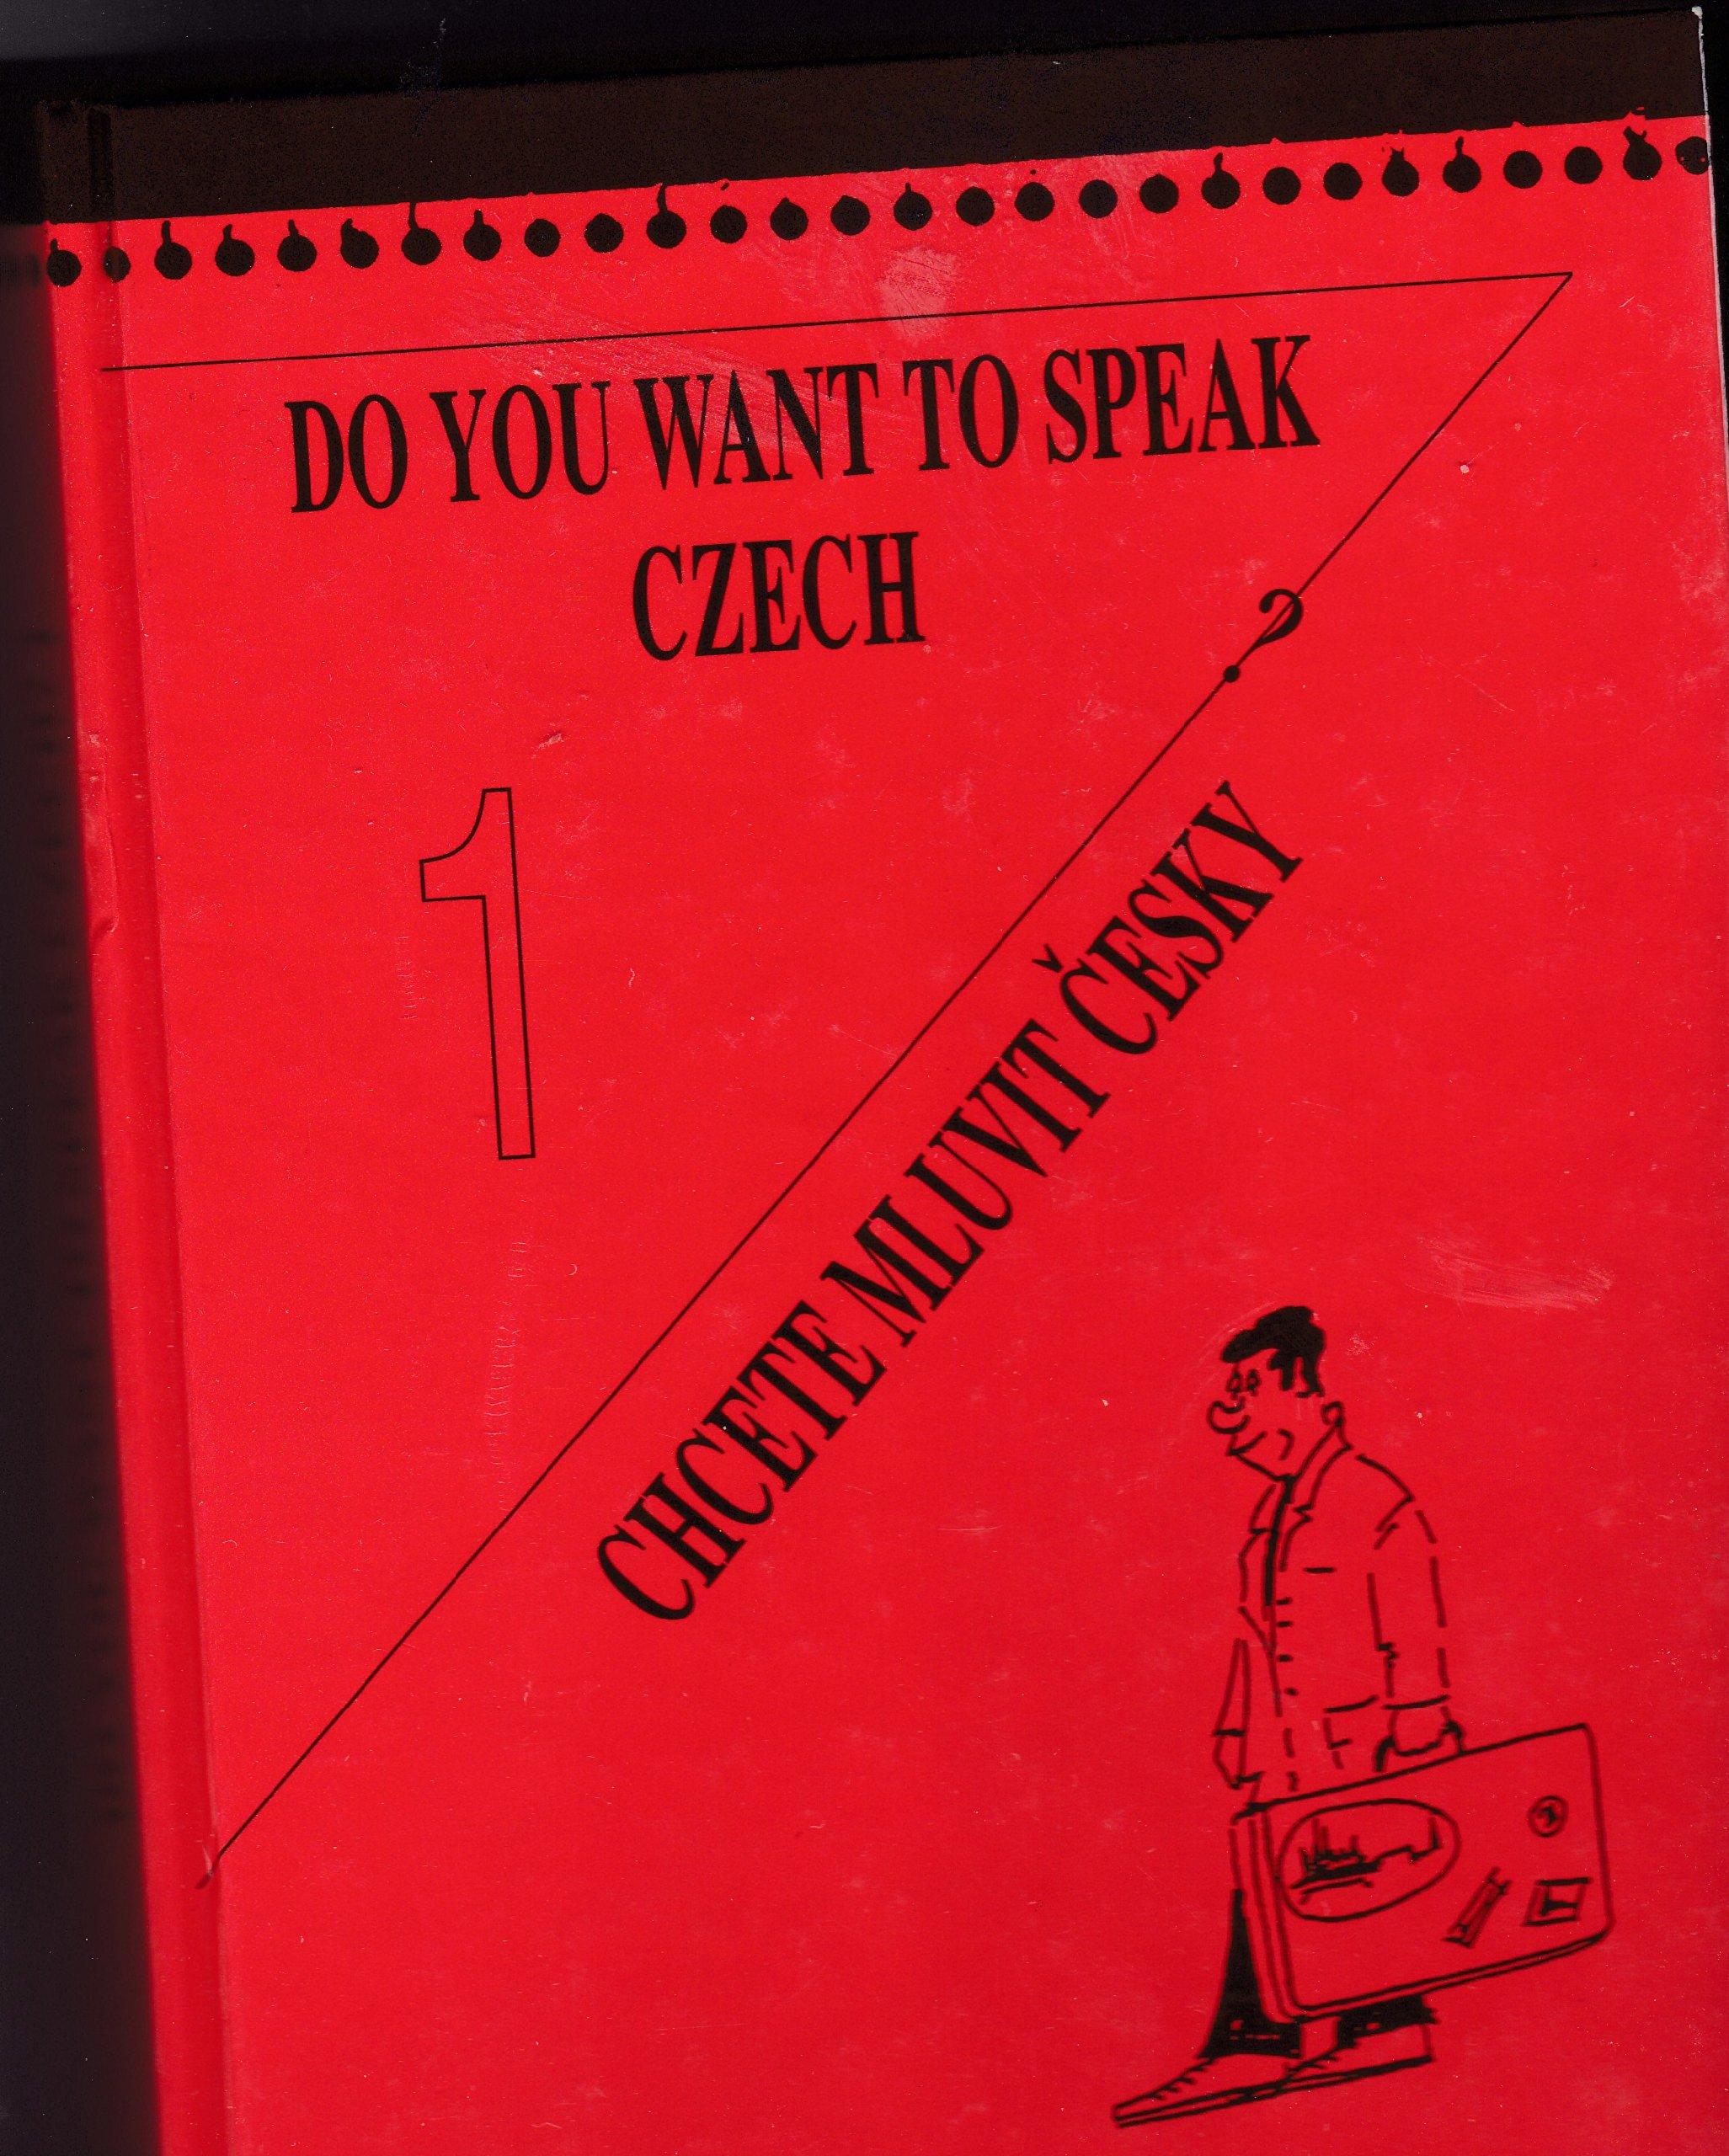 Do You Want to Speak Czech?: Czech for Beginners Bk. 1 pdf